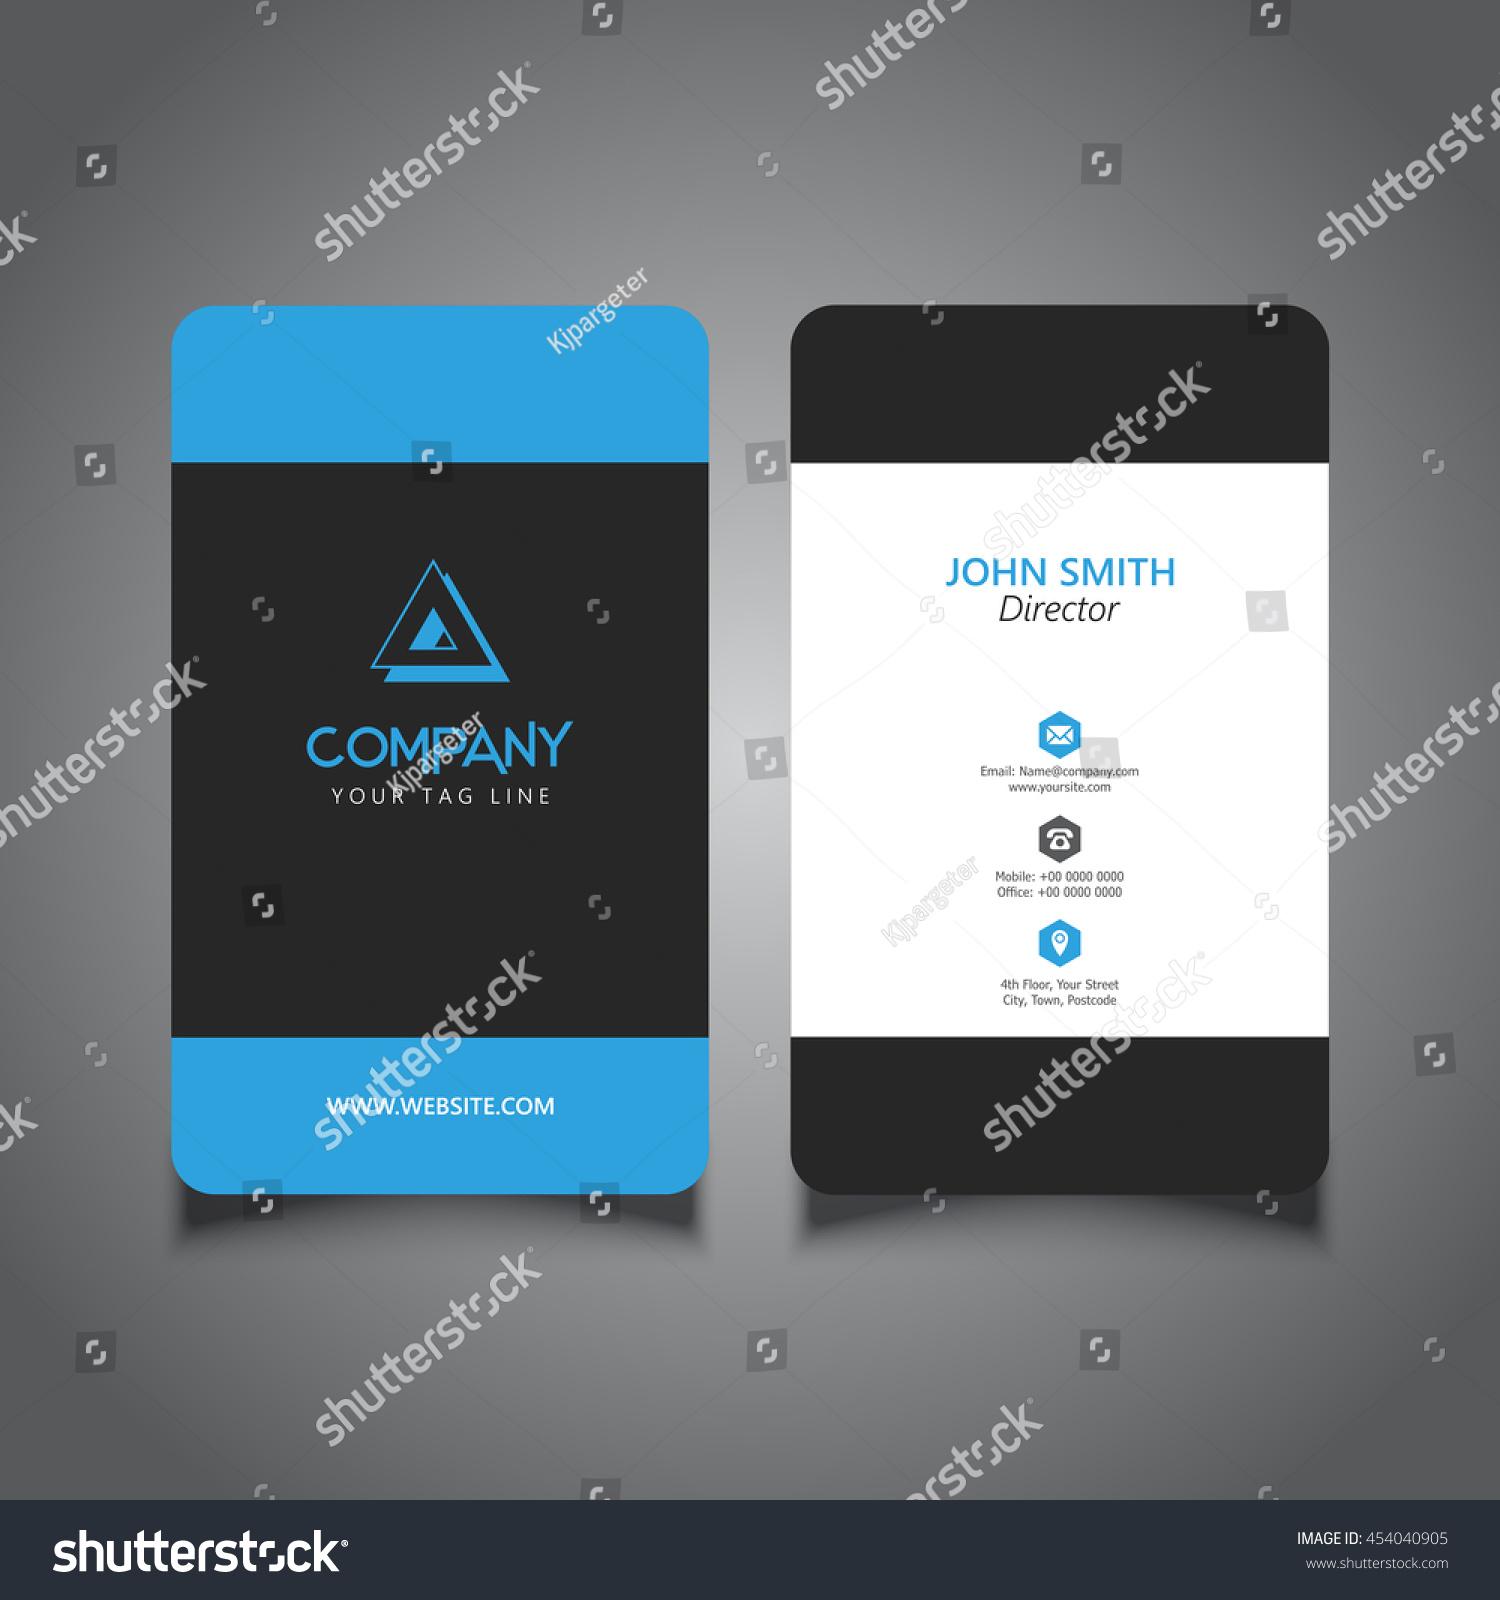 rounded corner business card modern design stock vector